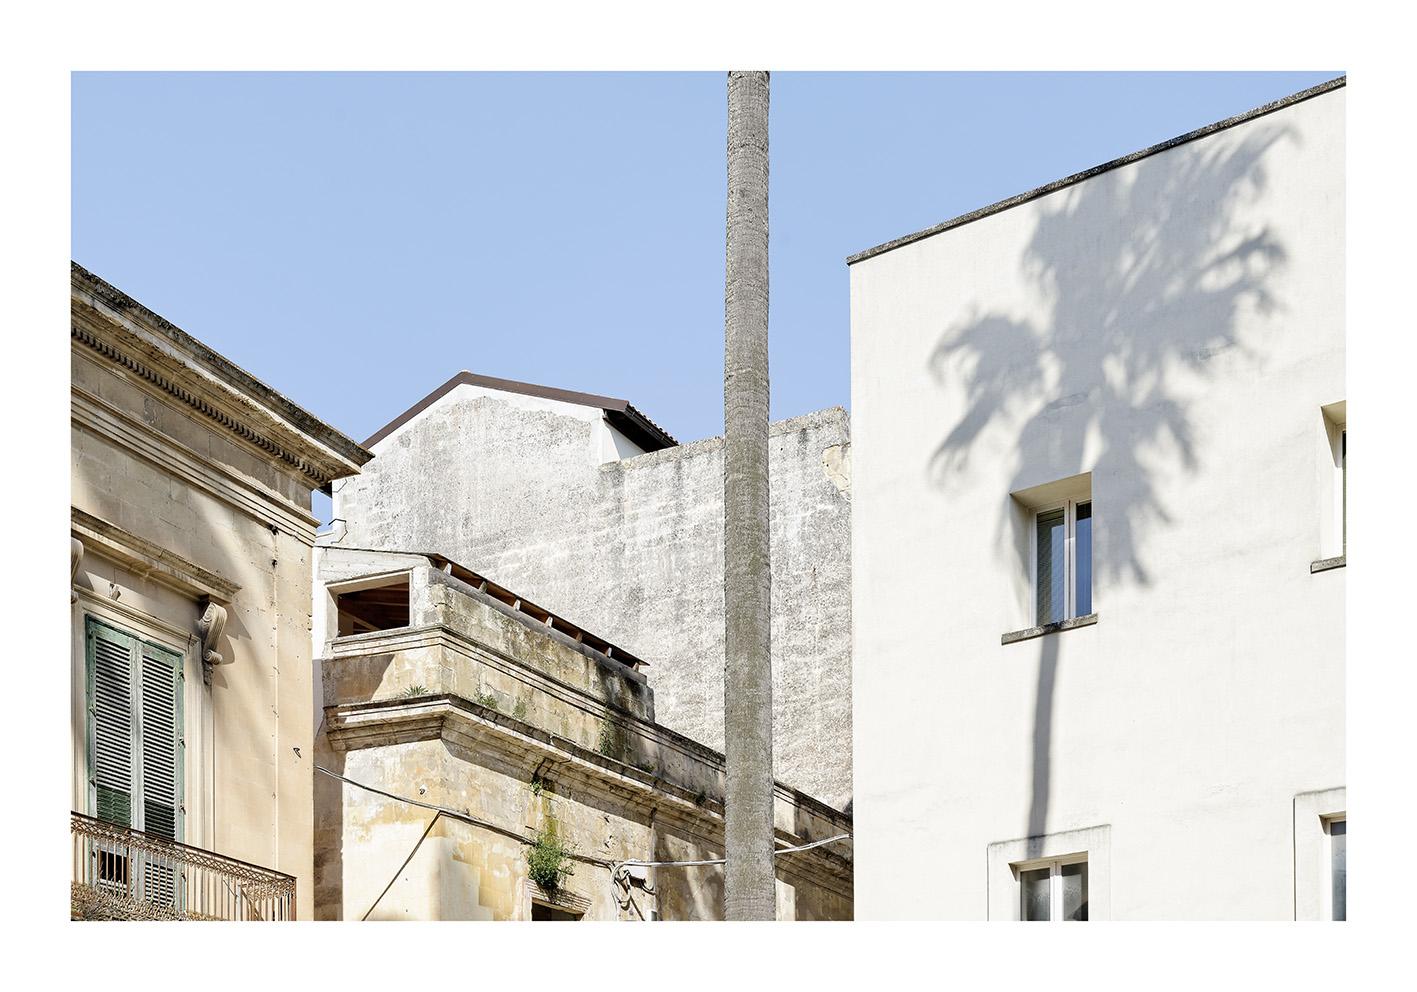 Franco-Sortini-Un-luogo-neutro-livin_art-fotografia2